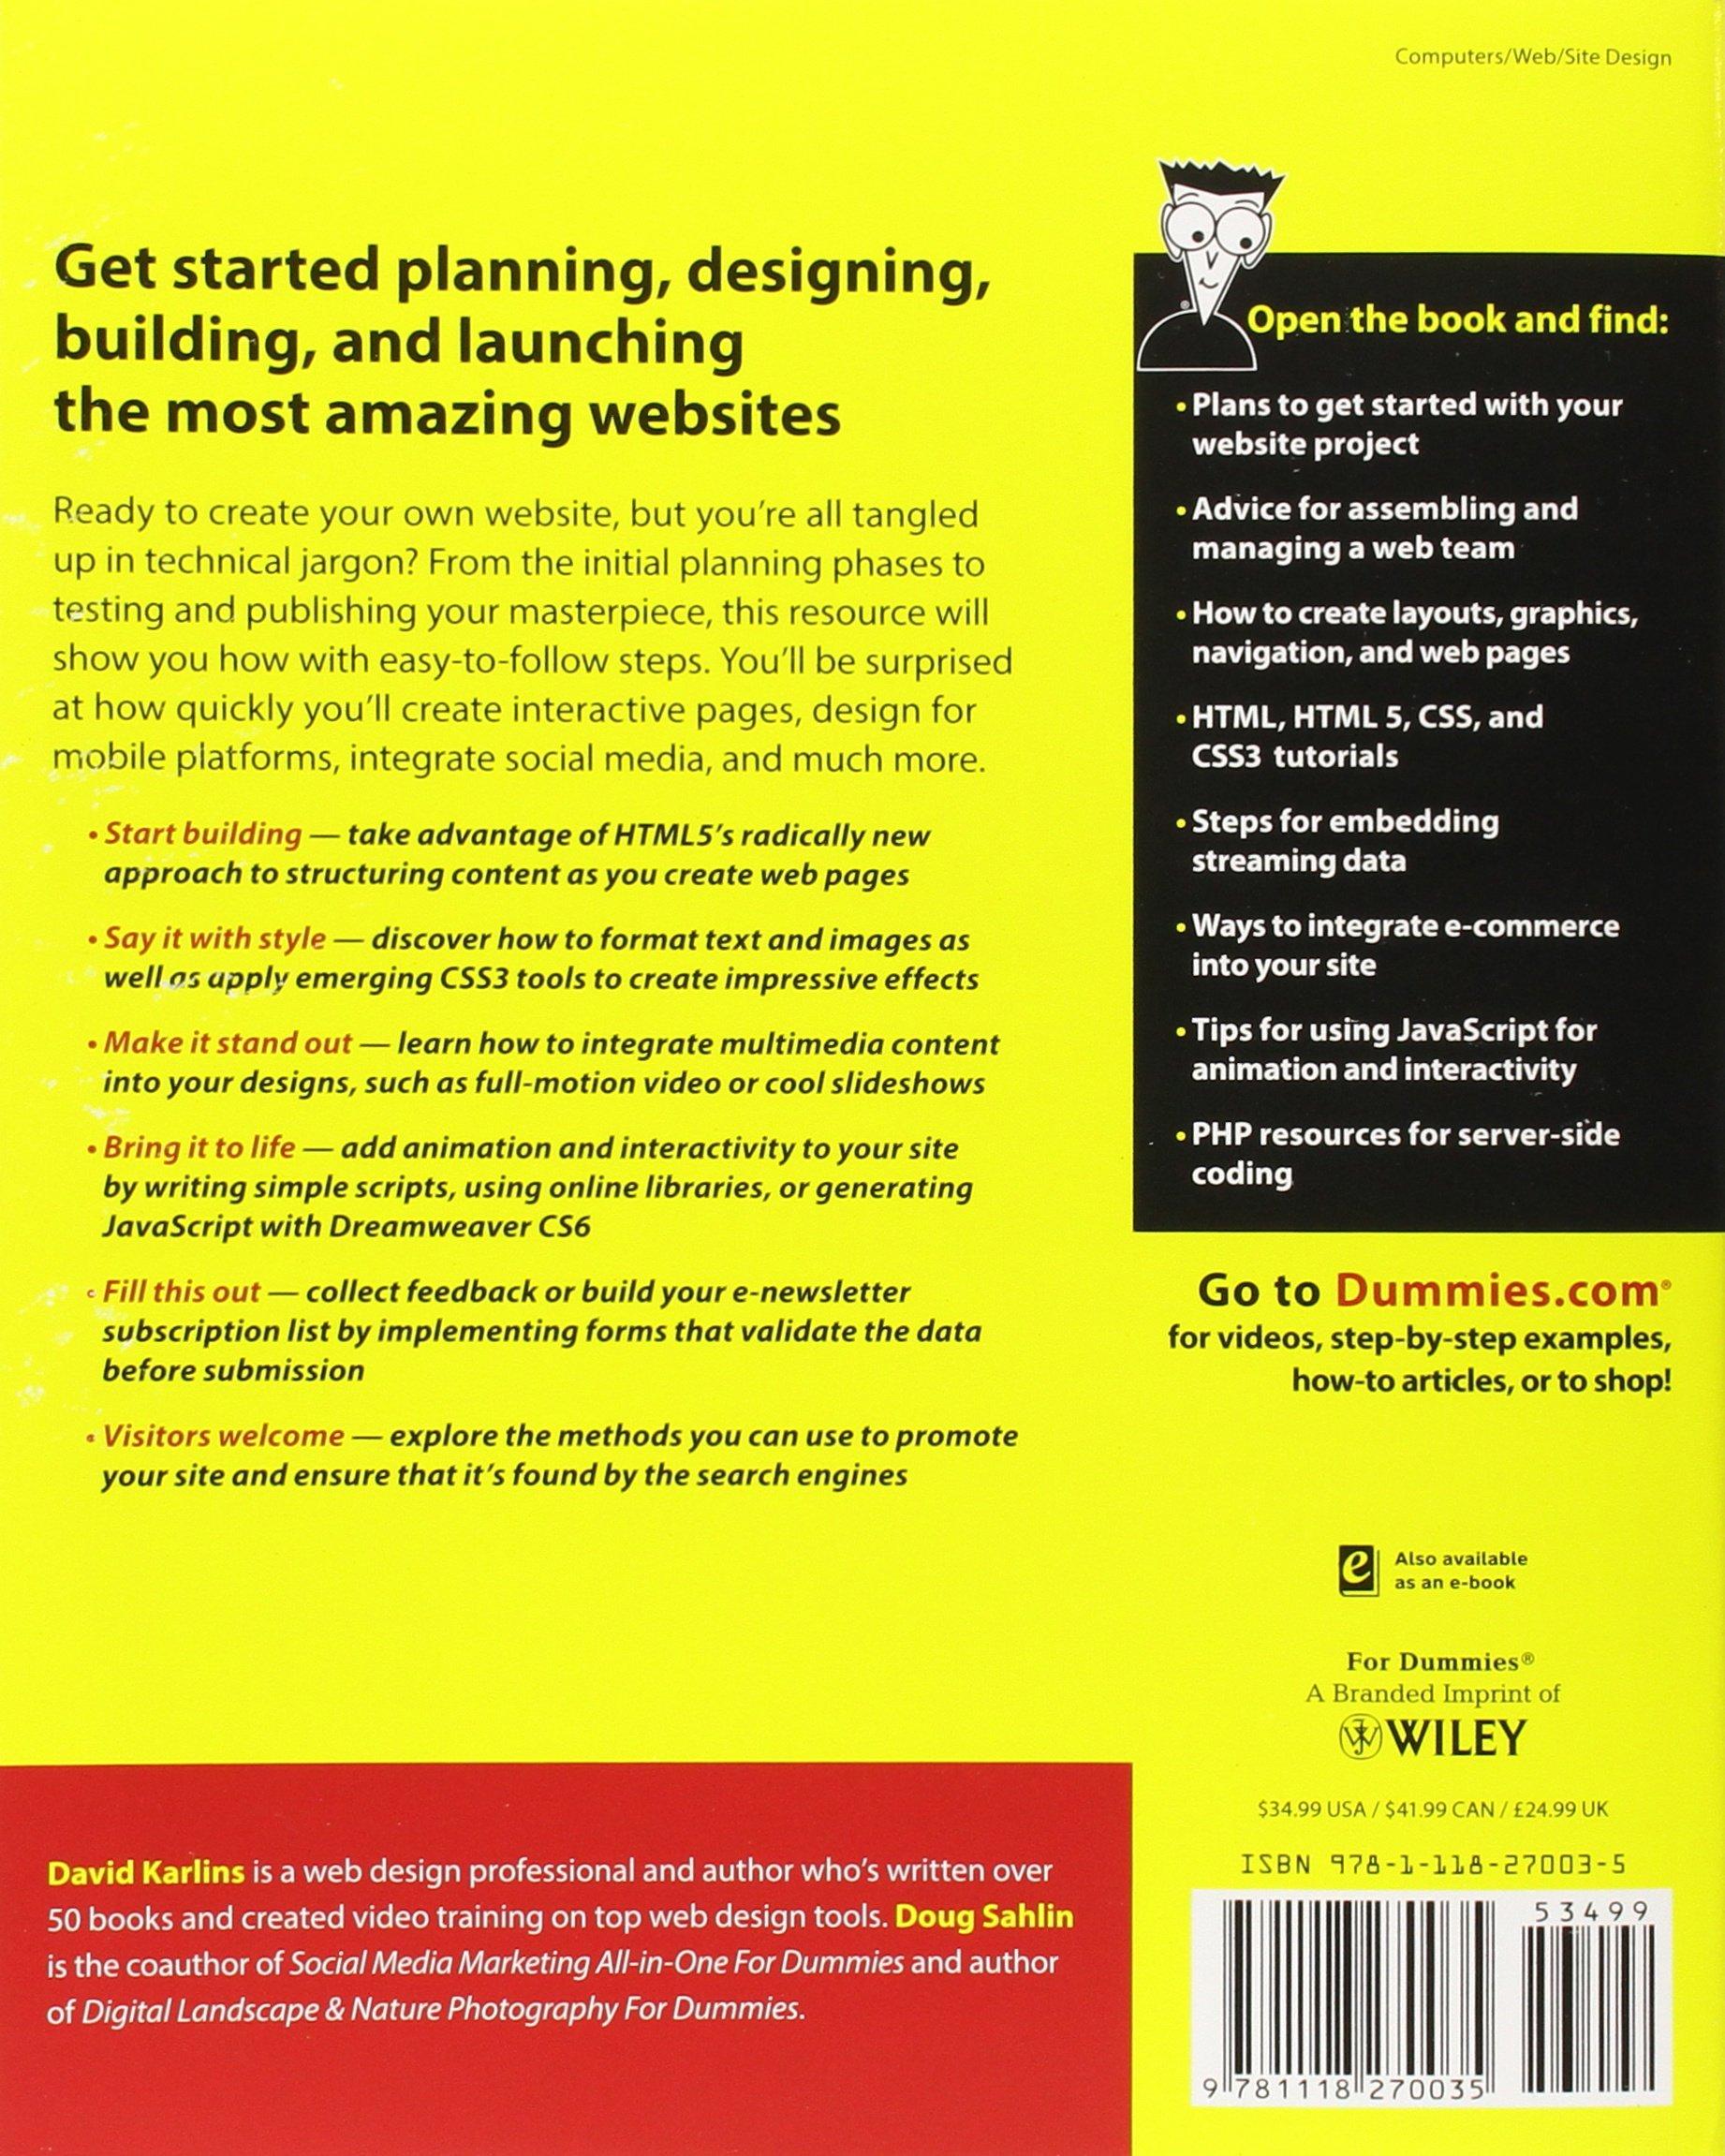 Building Websites Allinone For Dummies, 3rd Edition: Amazon: David  Karlins, Doug Sahlin: 9781118270035: Books